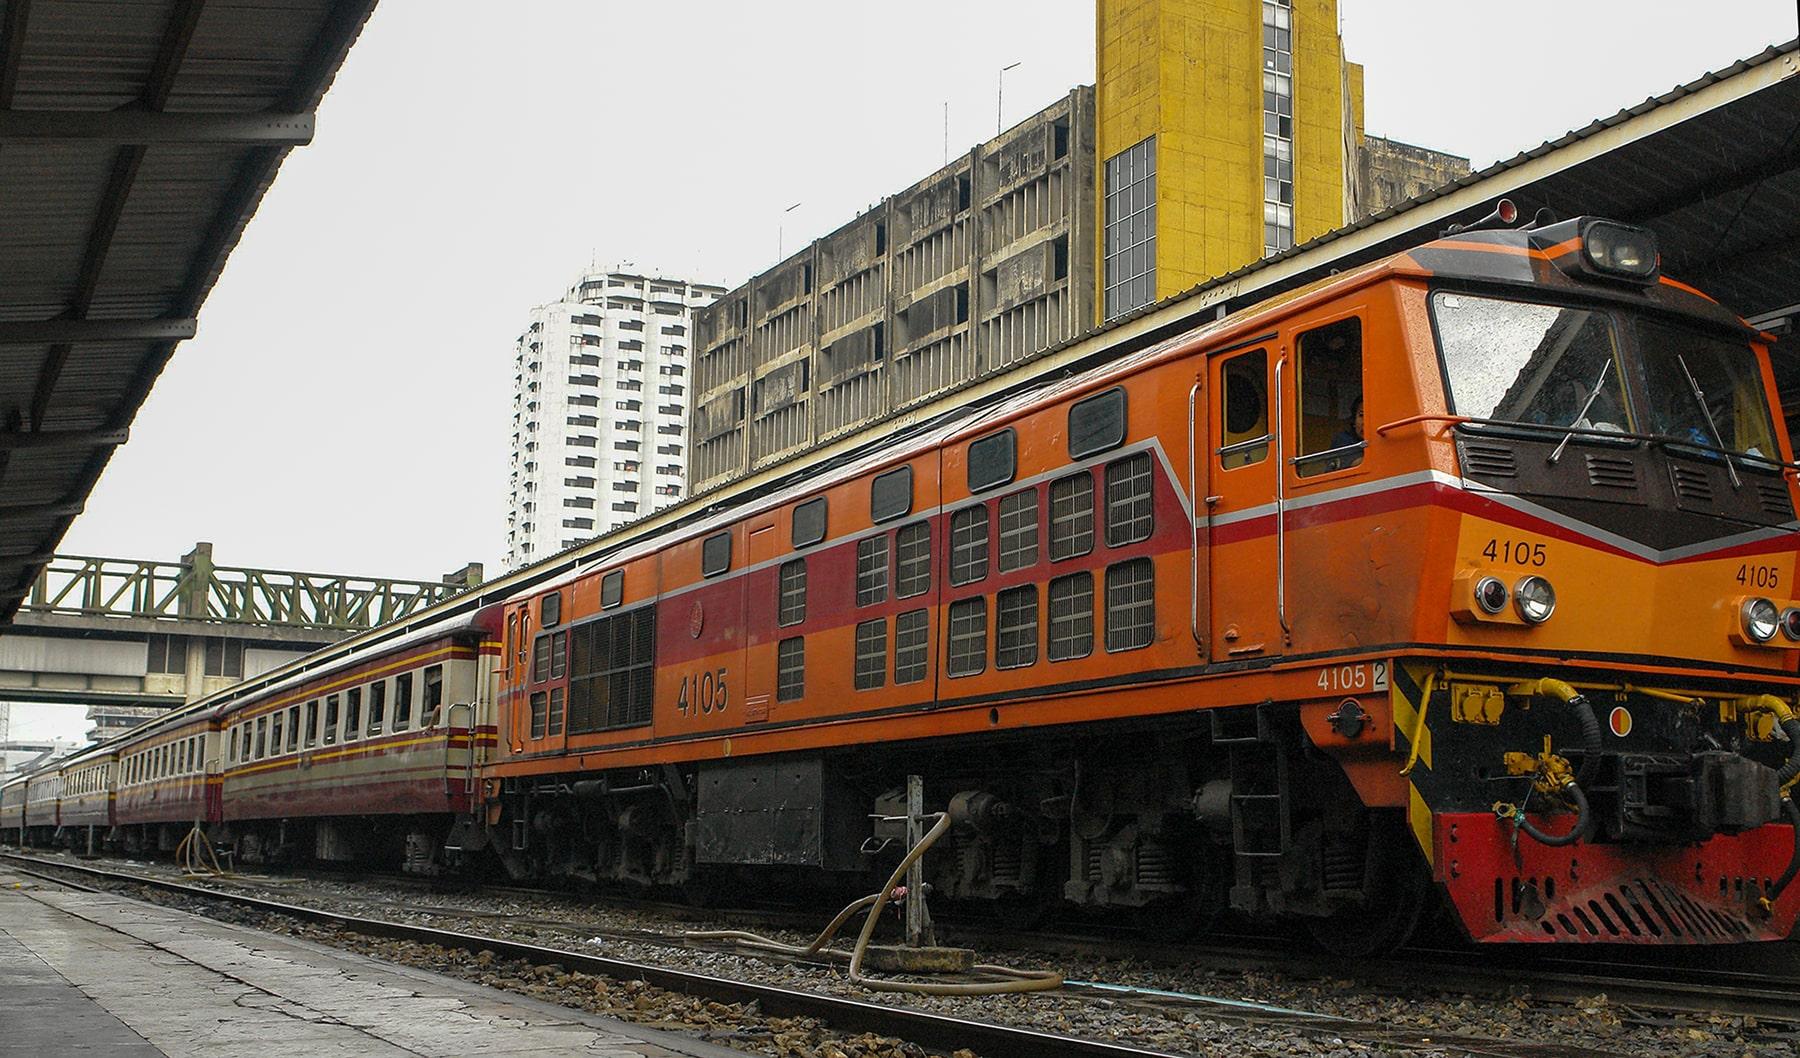 ©Foto: Marius Franke | railmen | Thailand – SP EXP DRC – Special Express Diesel Railcar